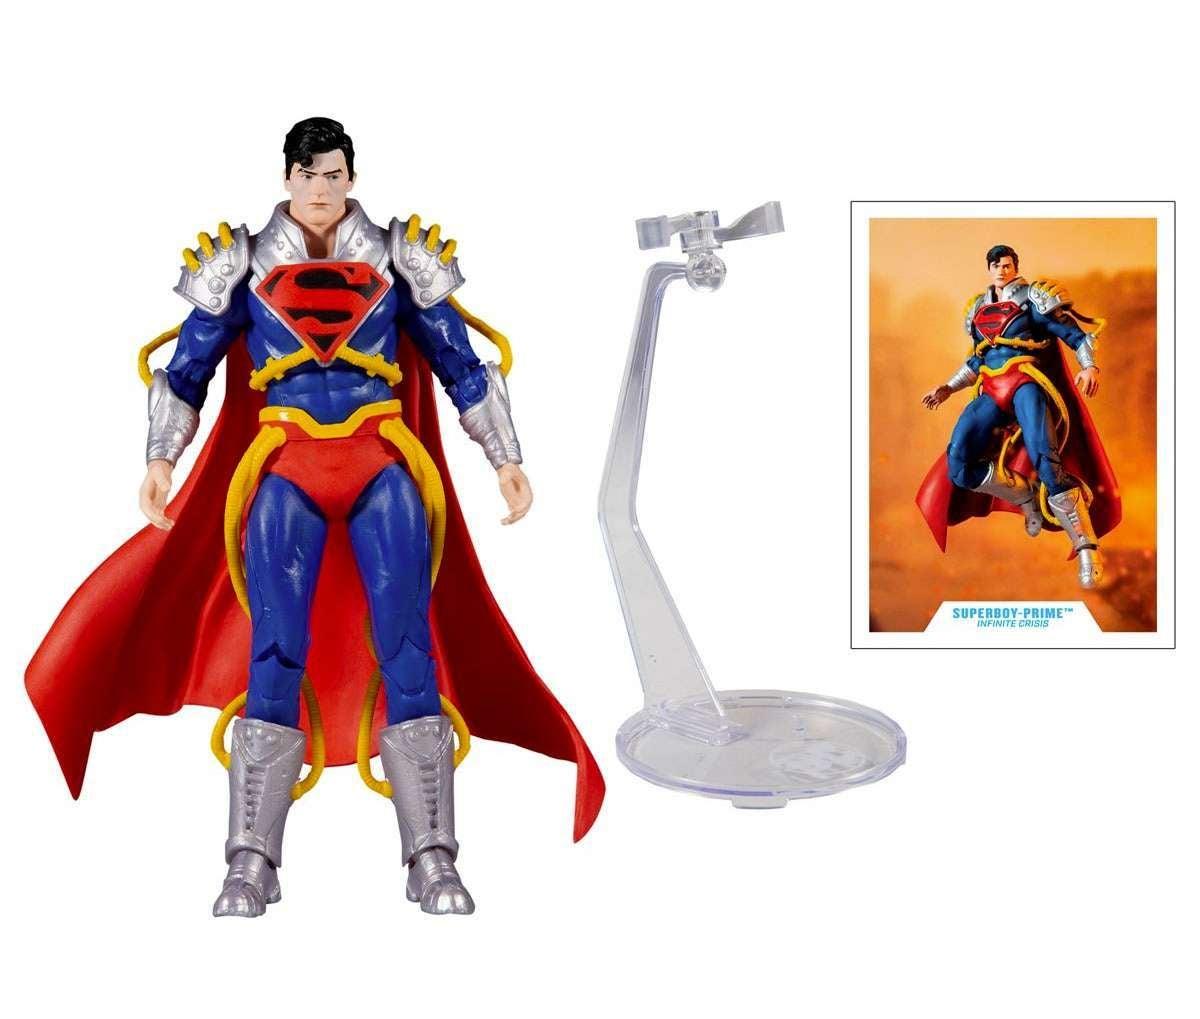 mcfarlane-superboy-prime